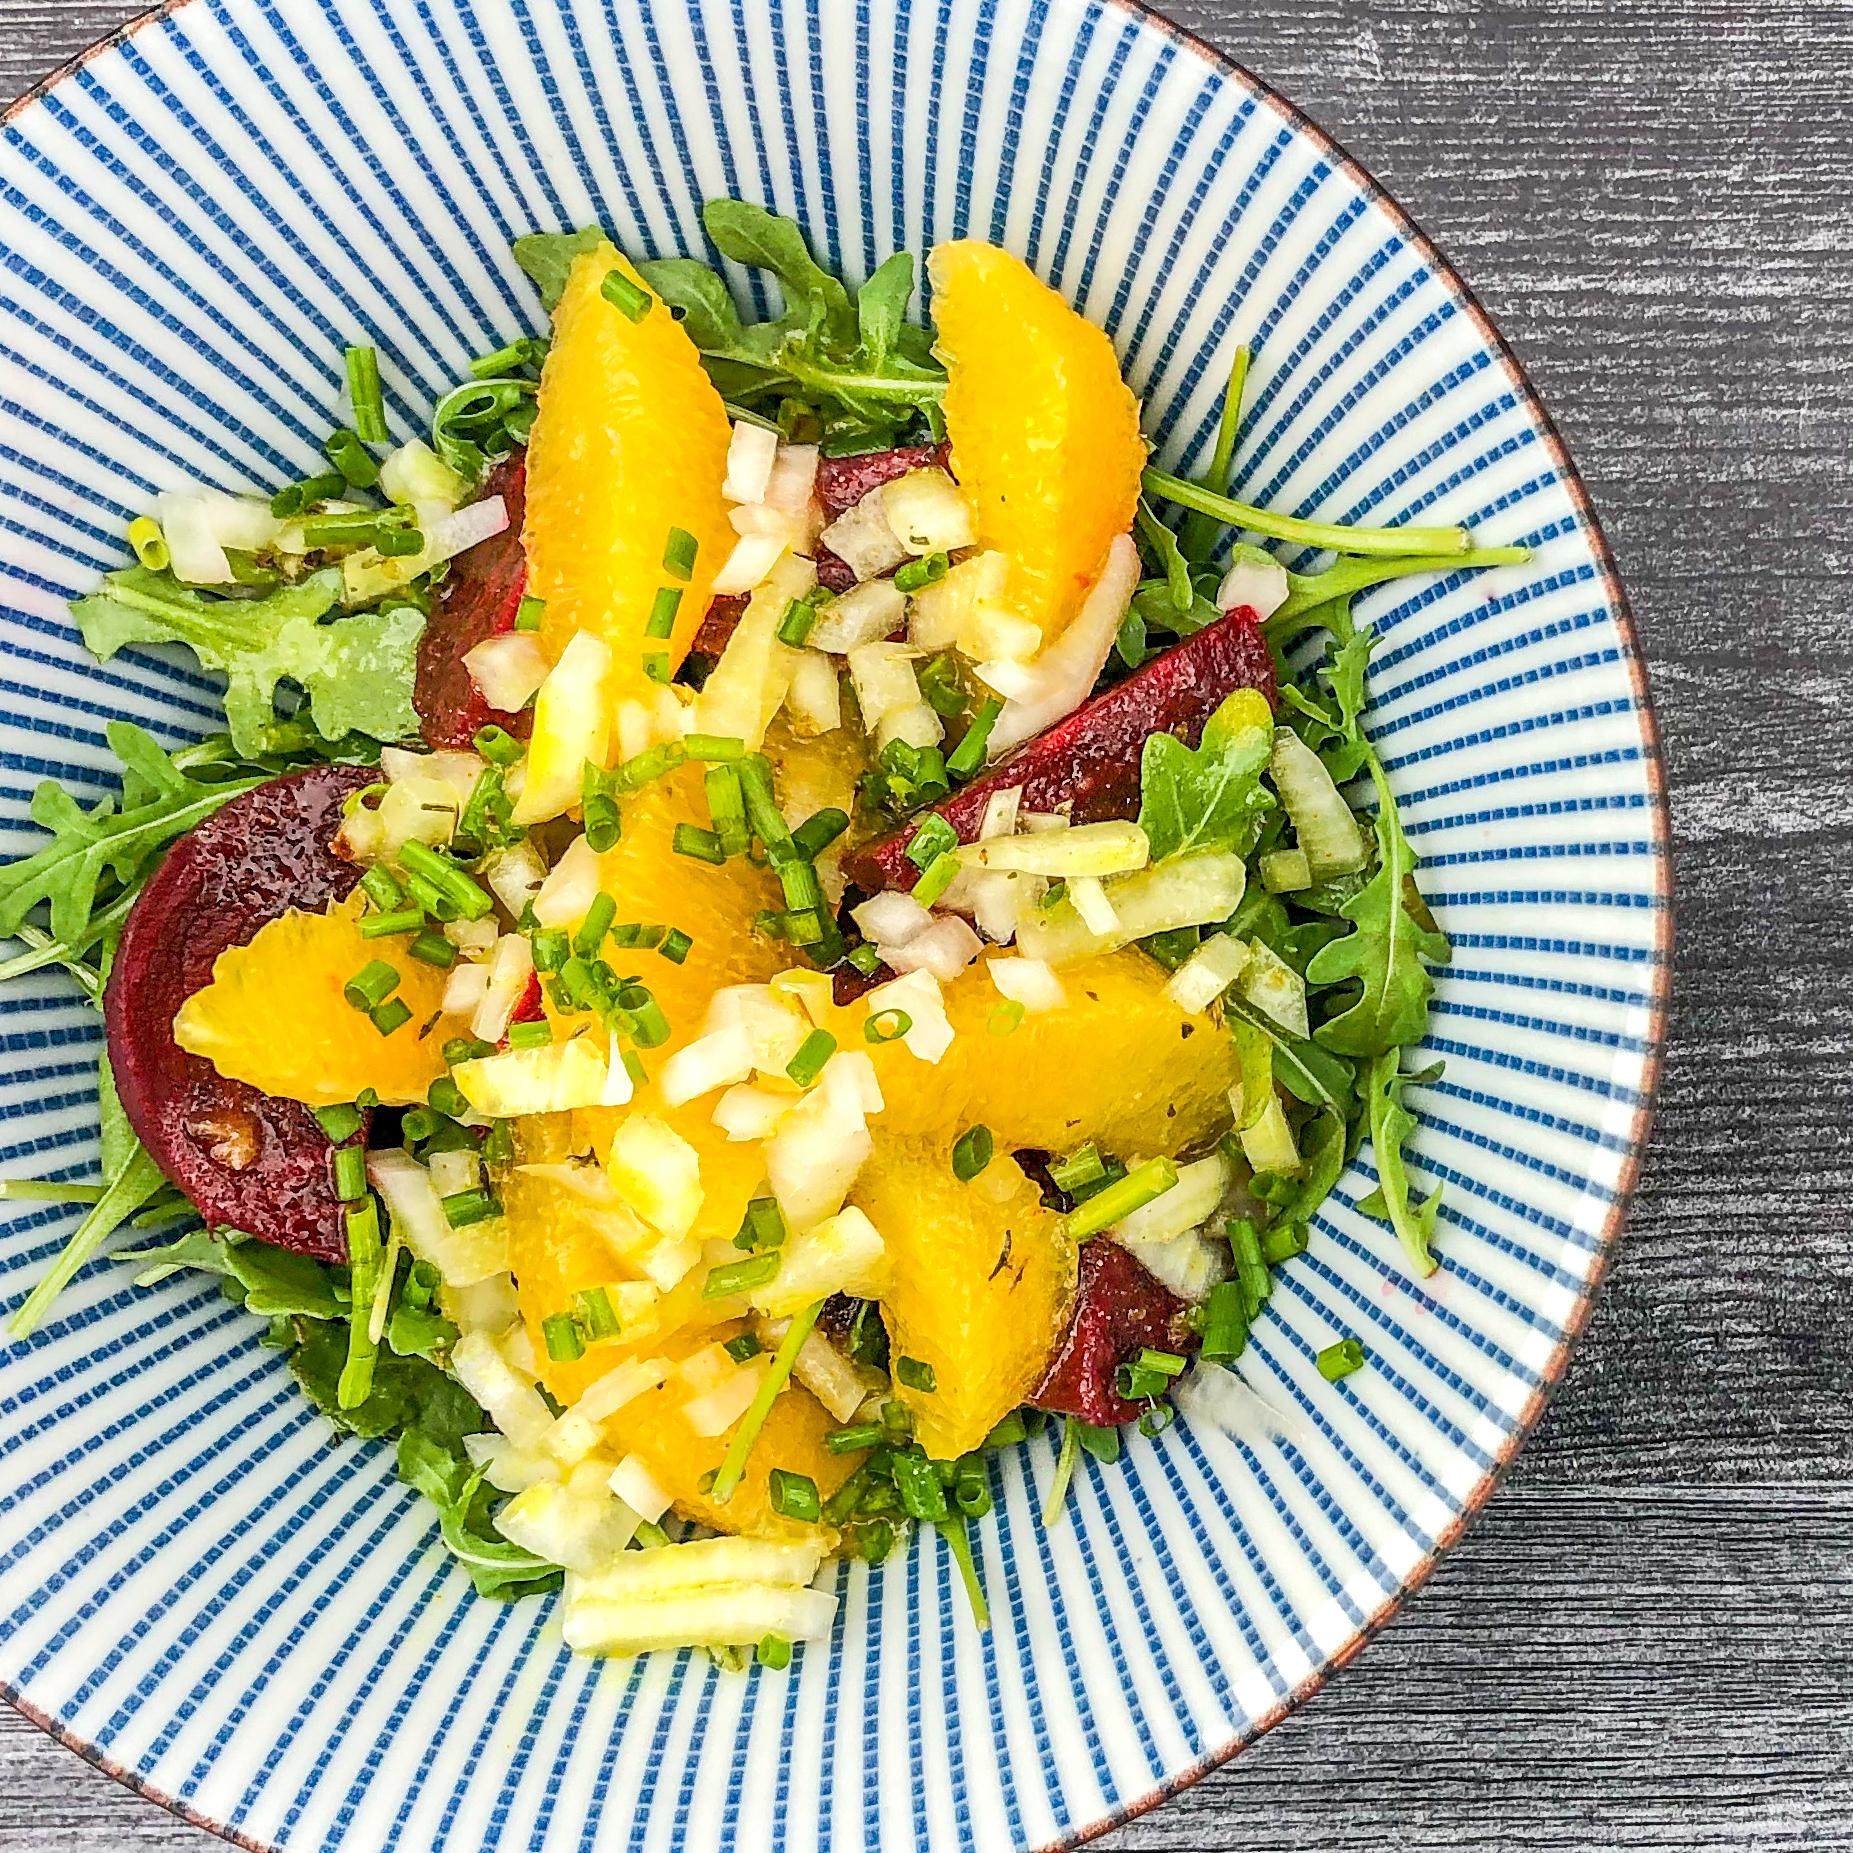 Beets Orange and Arugula in a Salad Bowl